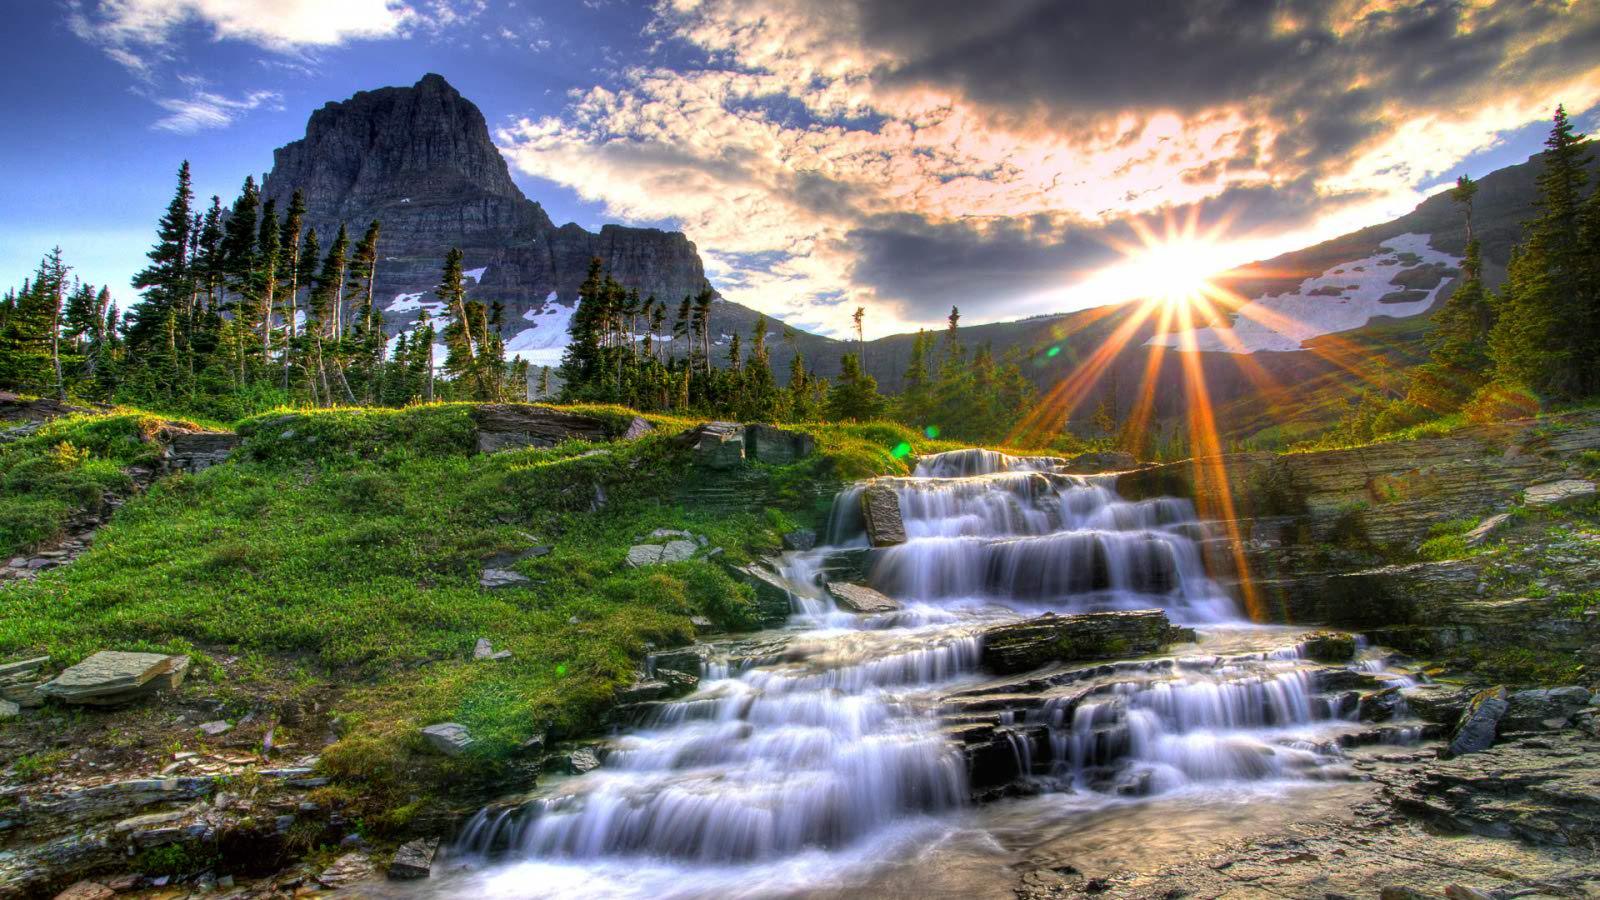 sunrise beautiful landscape image